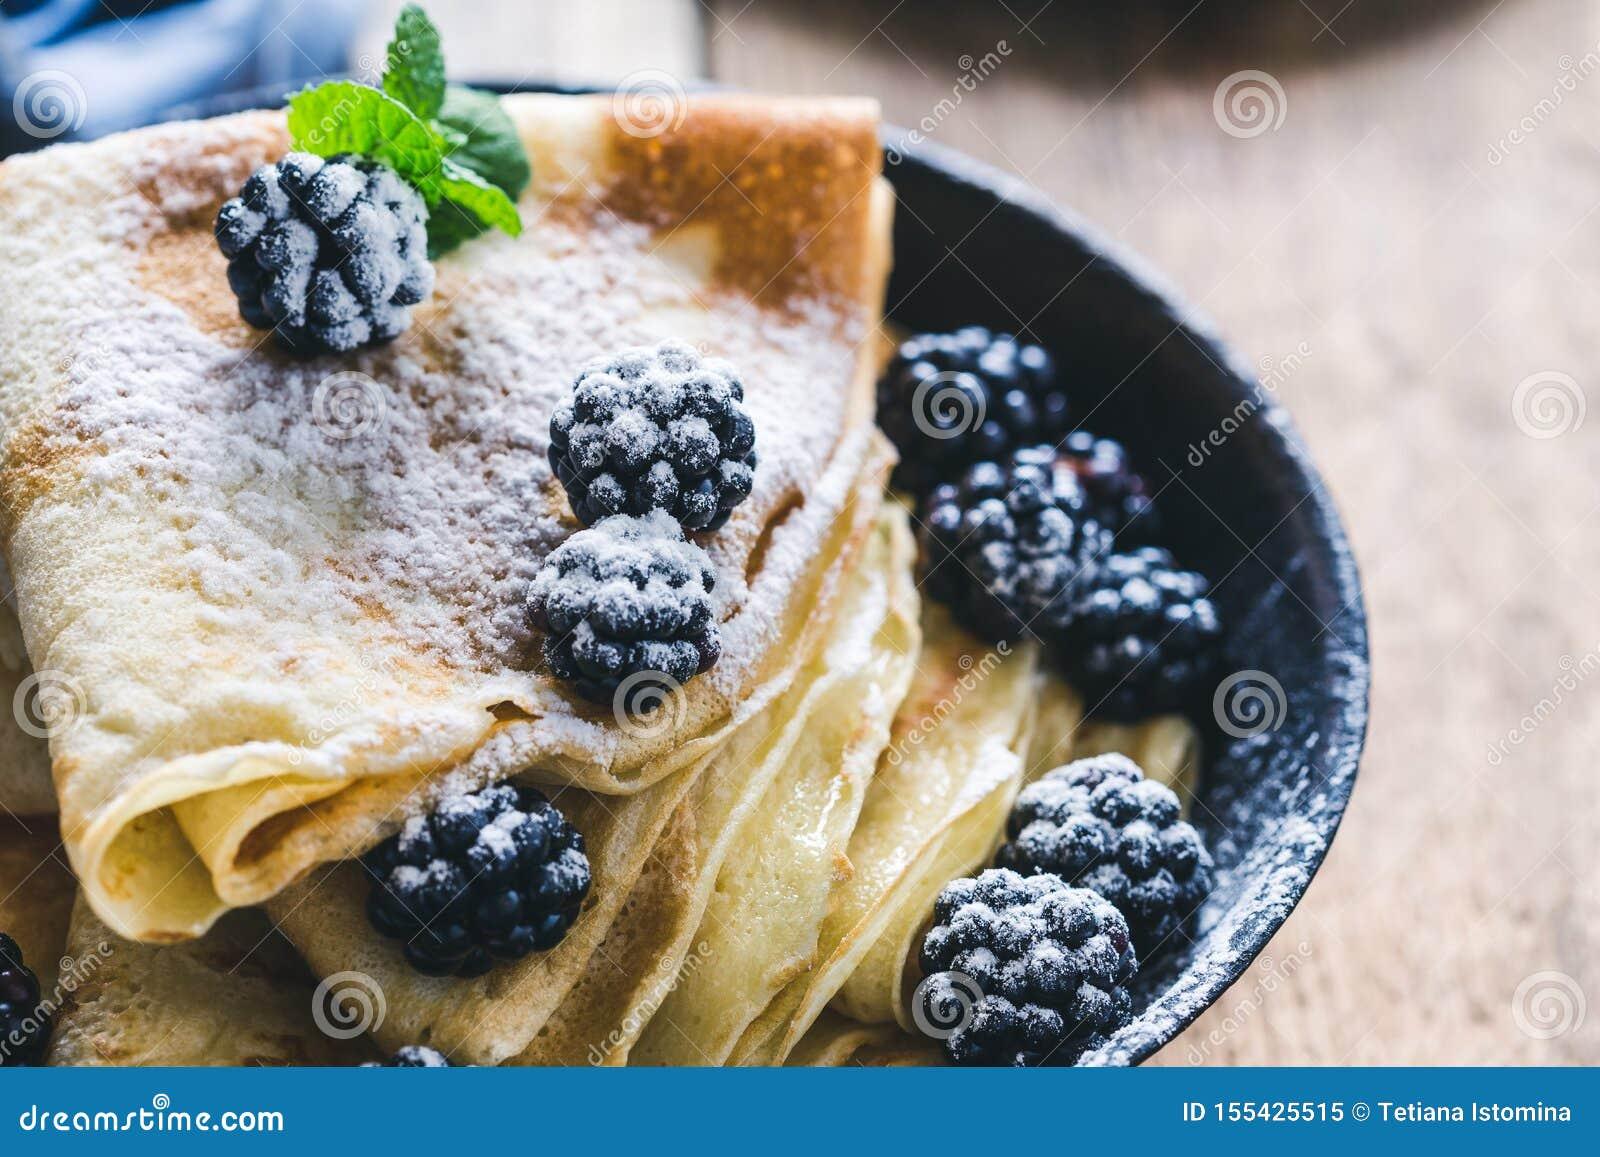 Homemade crepes, fresh summer blackberries powdered sugar